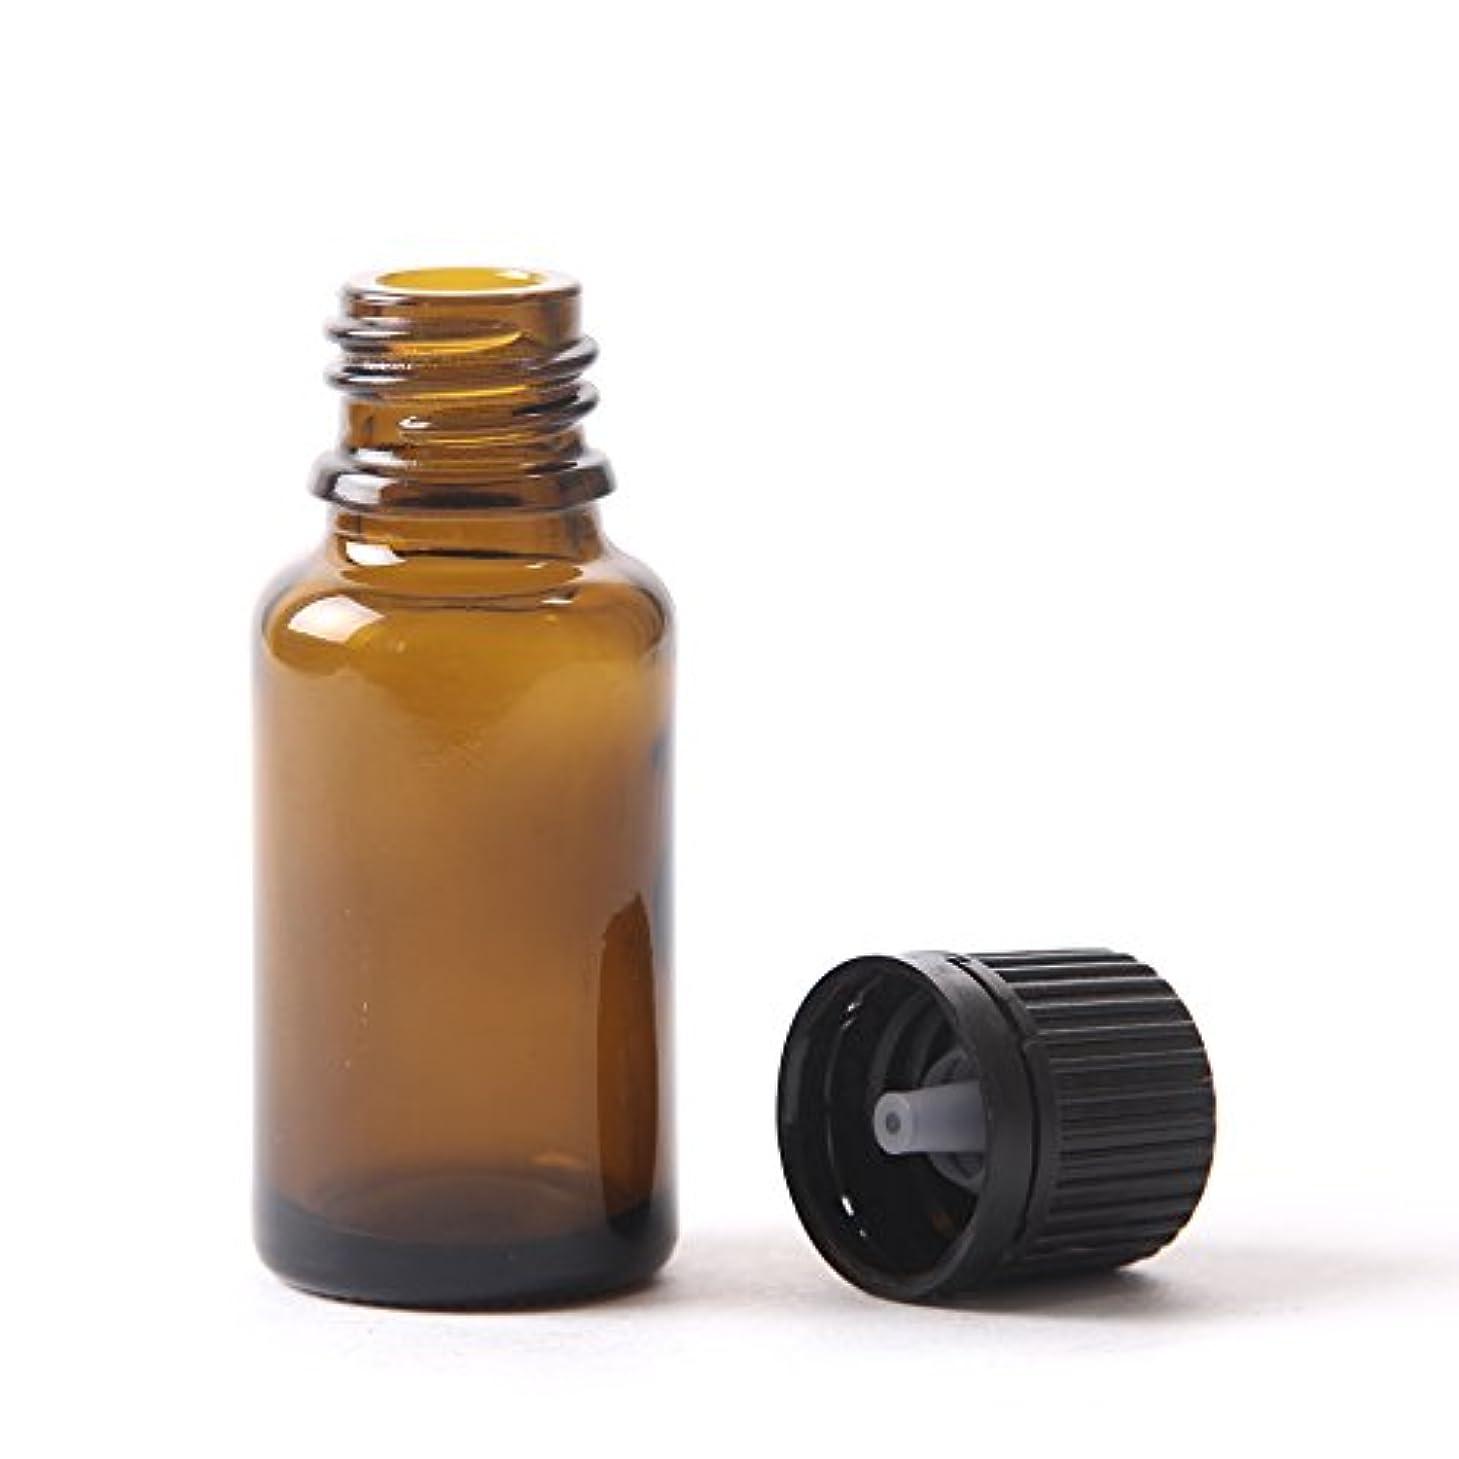 実験的翻訳者権威15ml Amber Glass Boston Round Bottle (With Black Tamper Evident Cap & Dropper) (156)